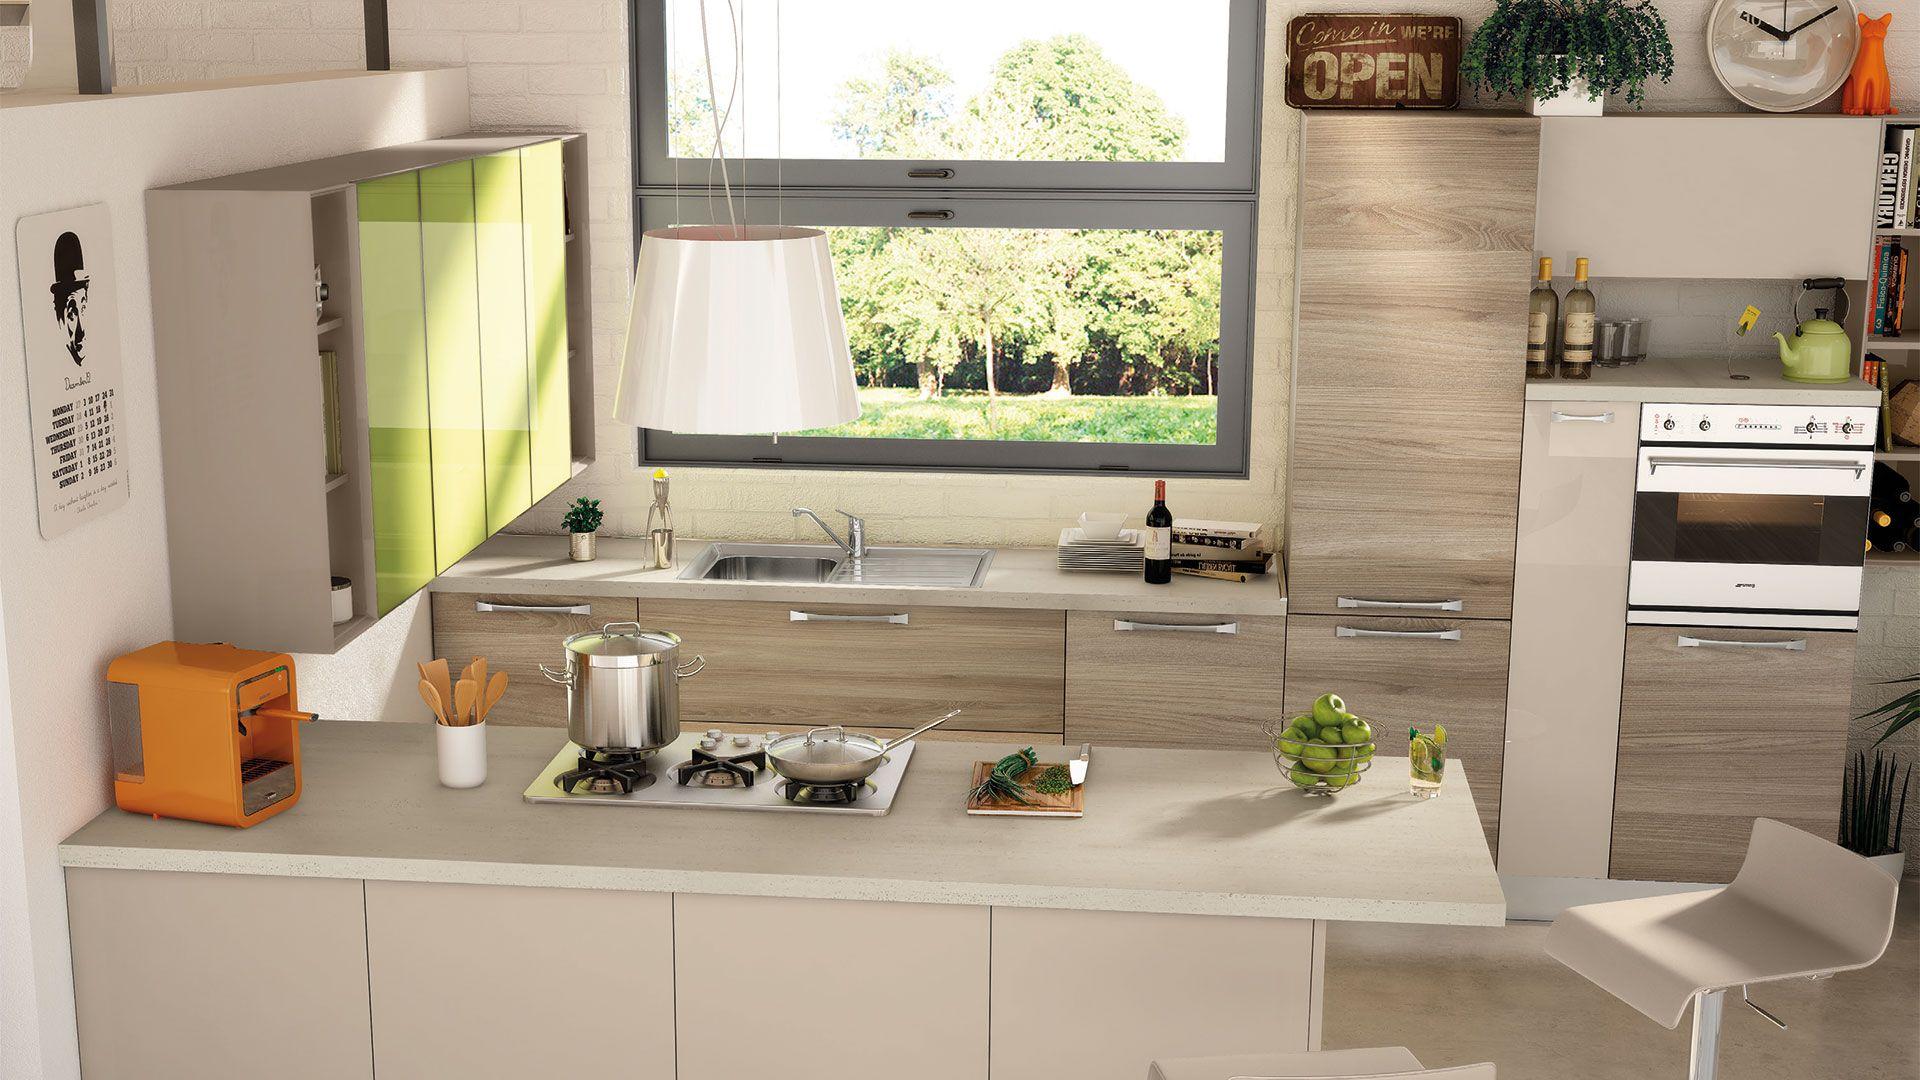 Noemi - Cucine Moderne - Cucine Lube | cucina nel 2019 ...